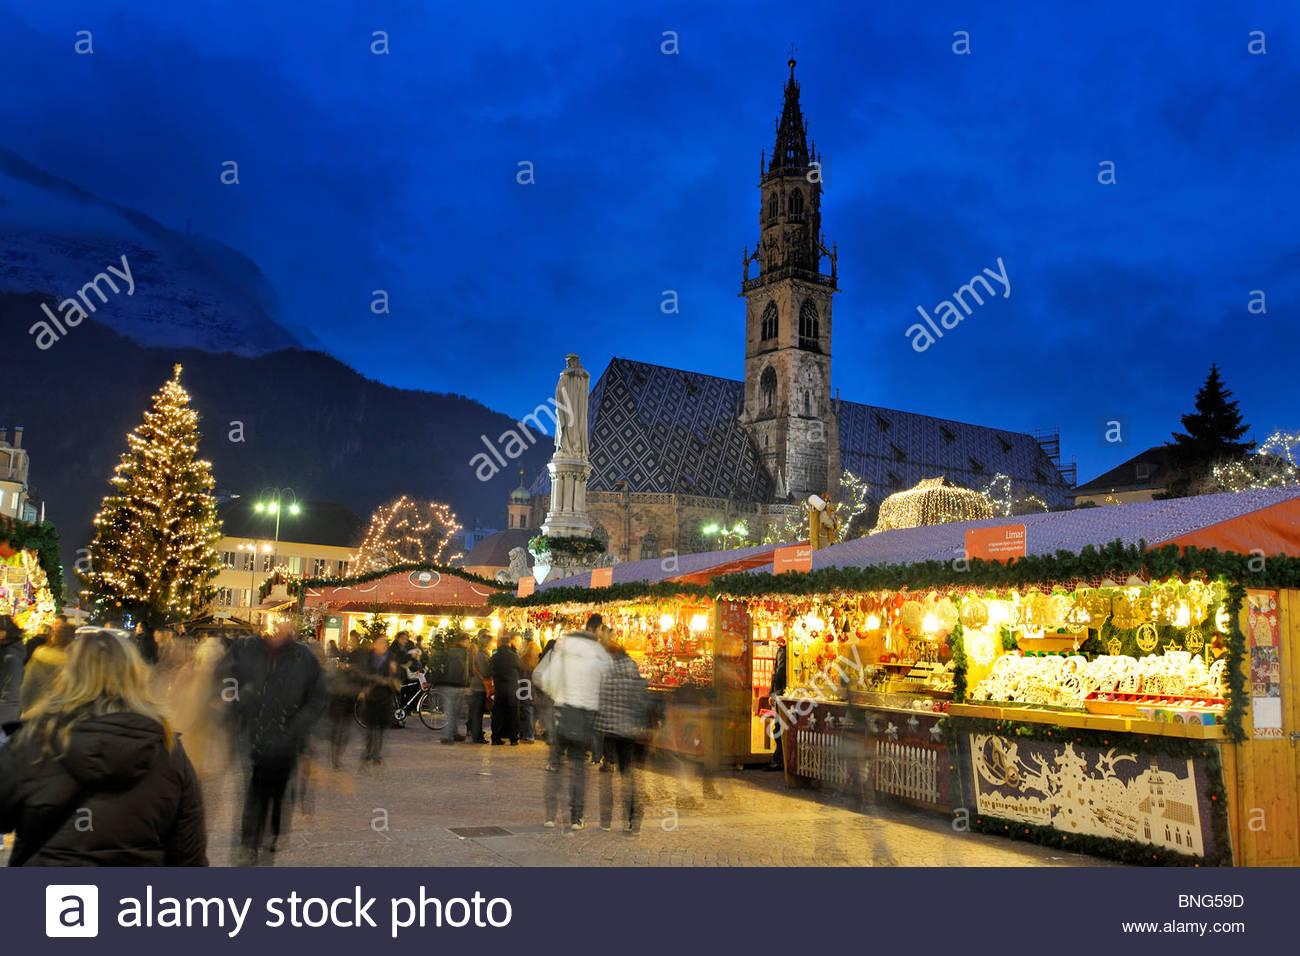 Marché de Noël,Piazza Walther, Bolzano, Trentin-Haut-Adige, Italie Photo Stock